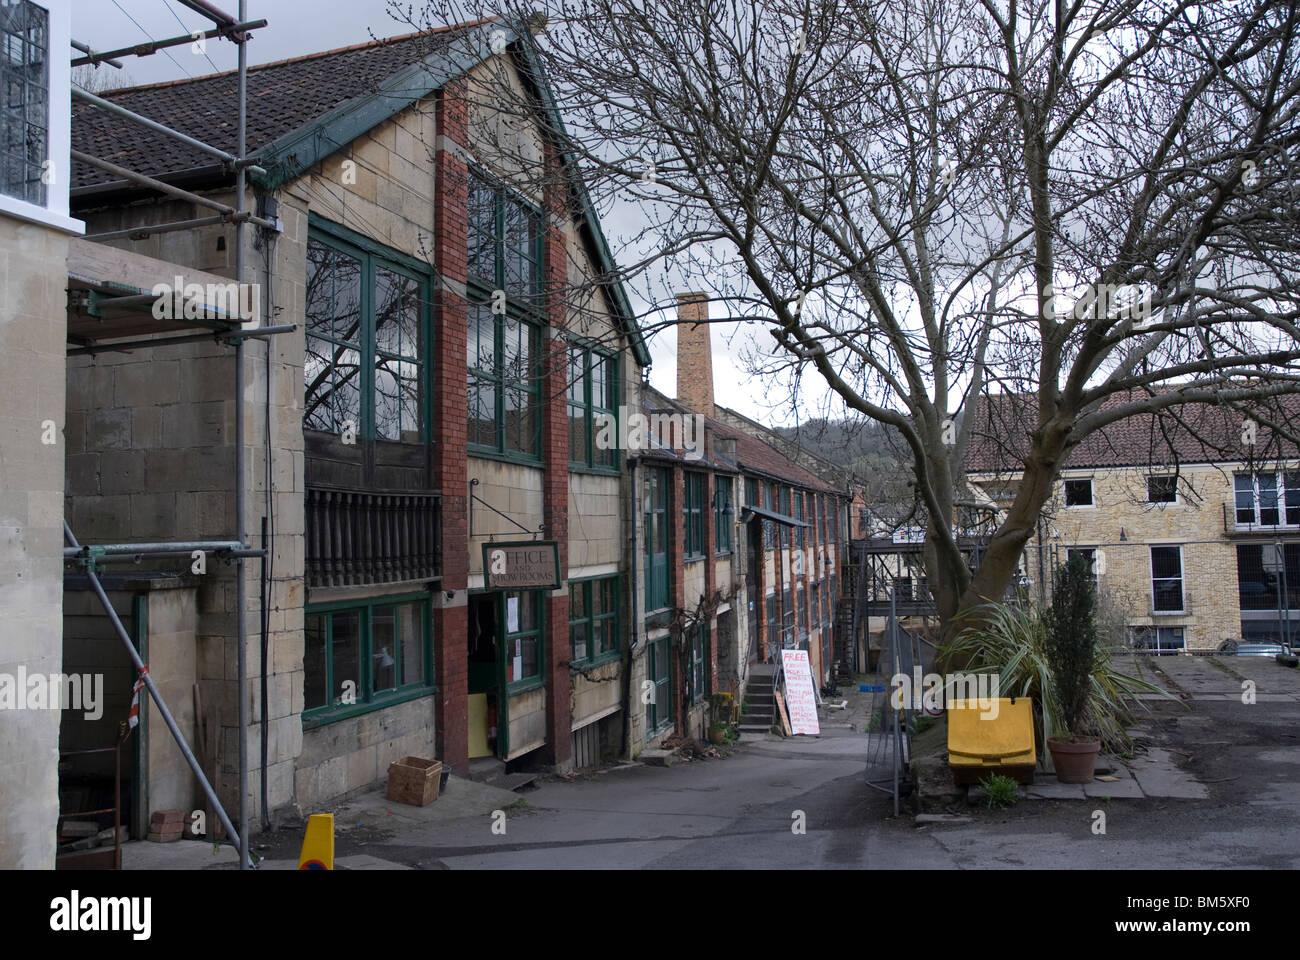 Walcot Reclamation Yard, Bath Spa, Somerset UK Stock Photo: 29634052 ...